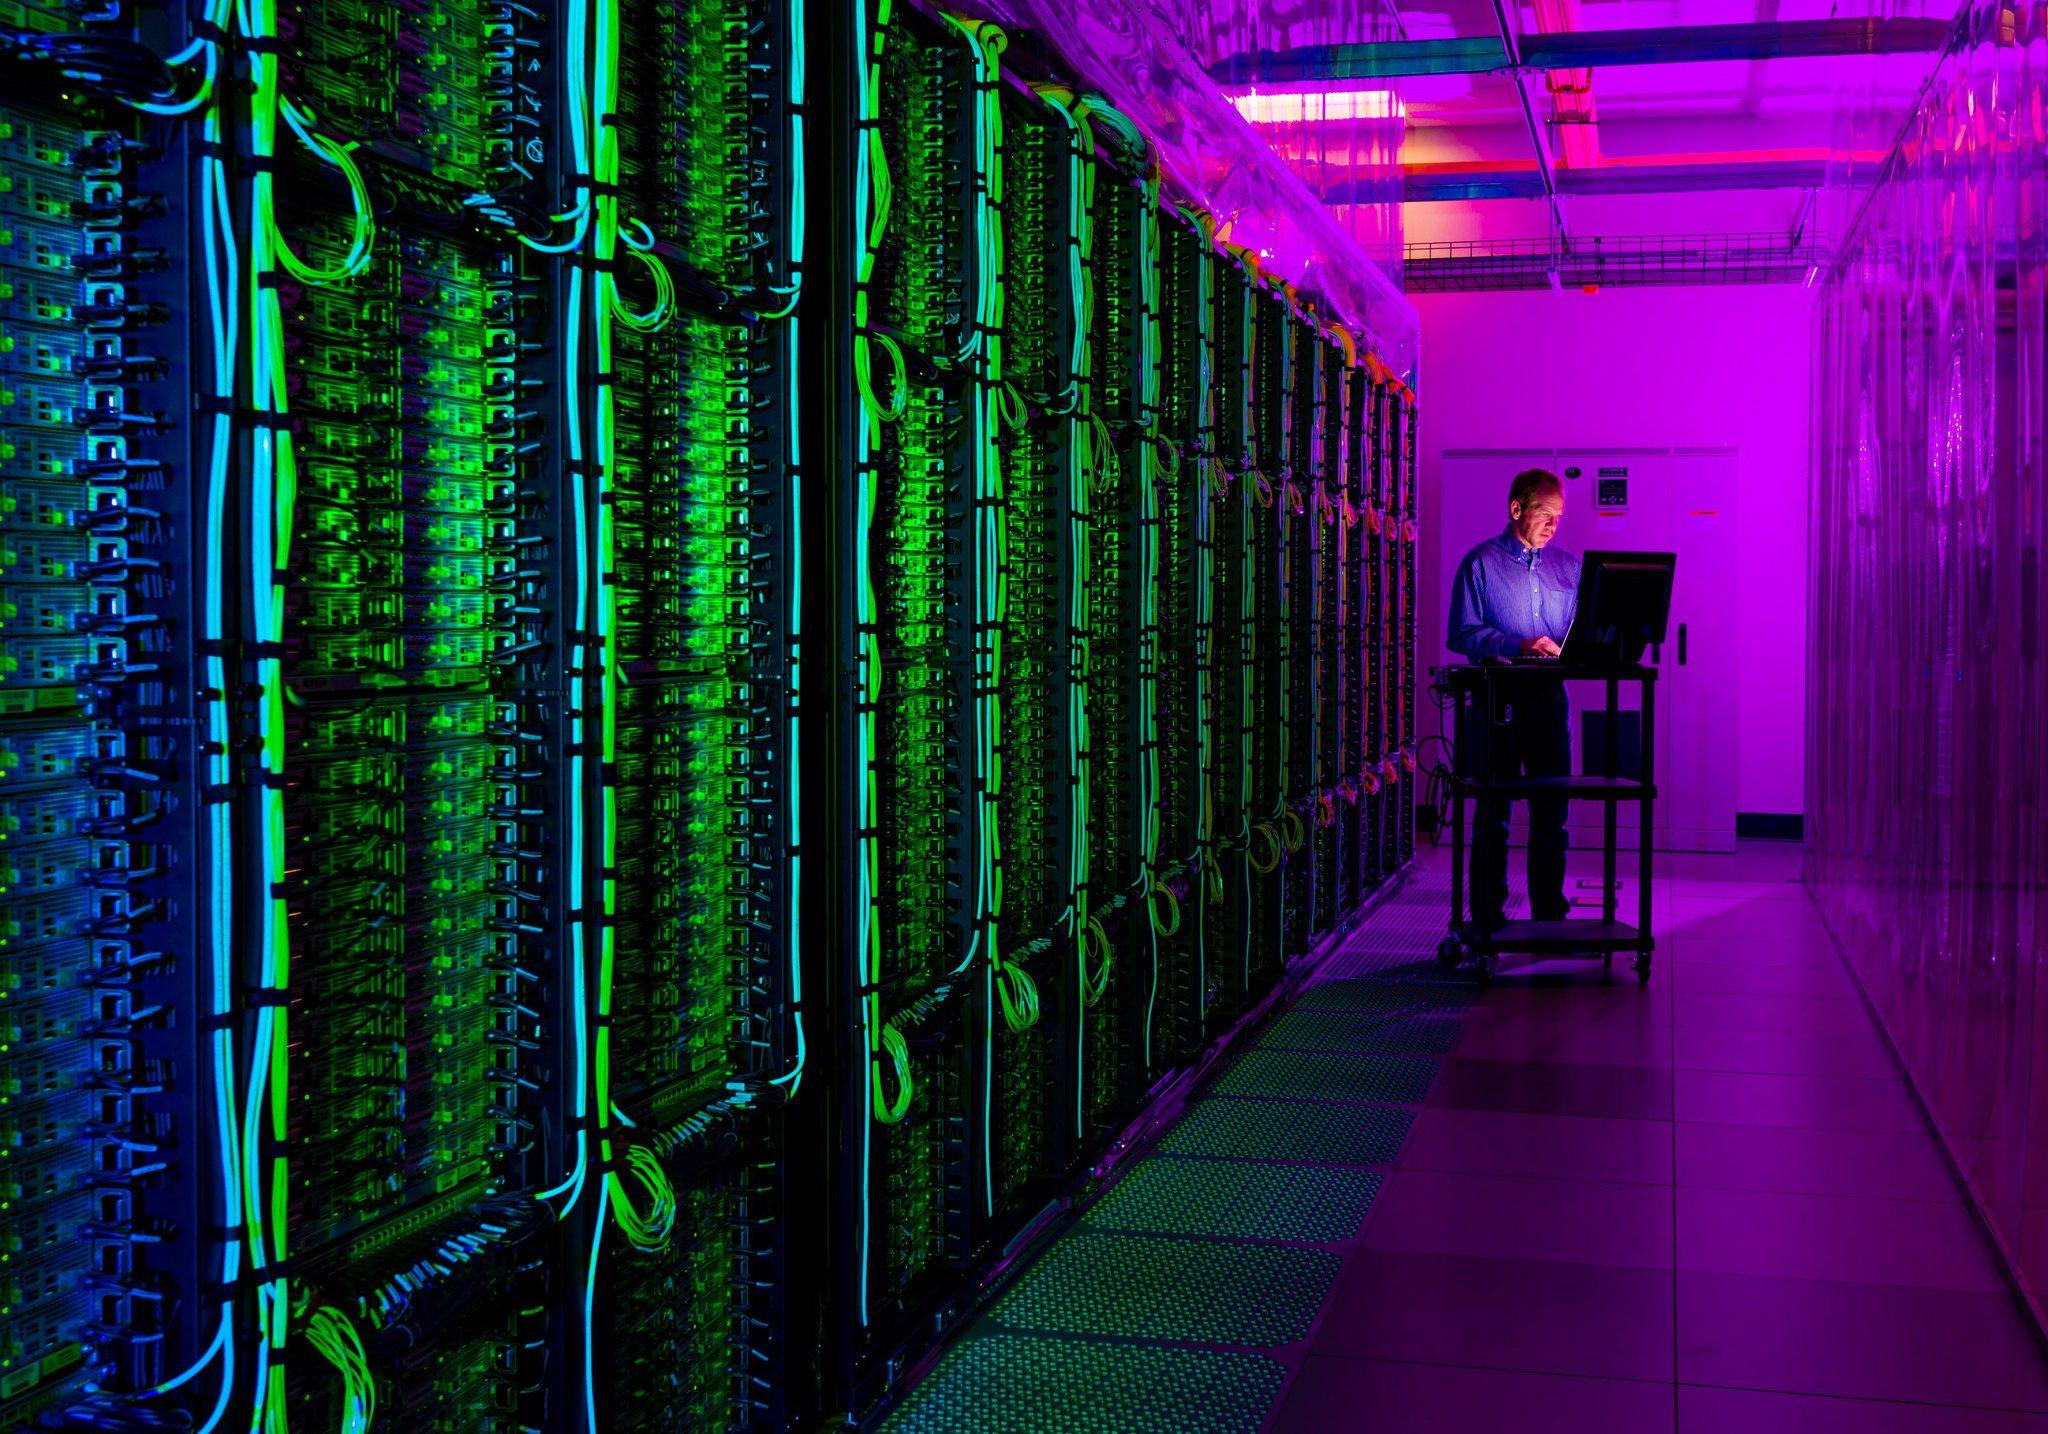 Microsoft's Quincy Washington data center